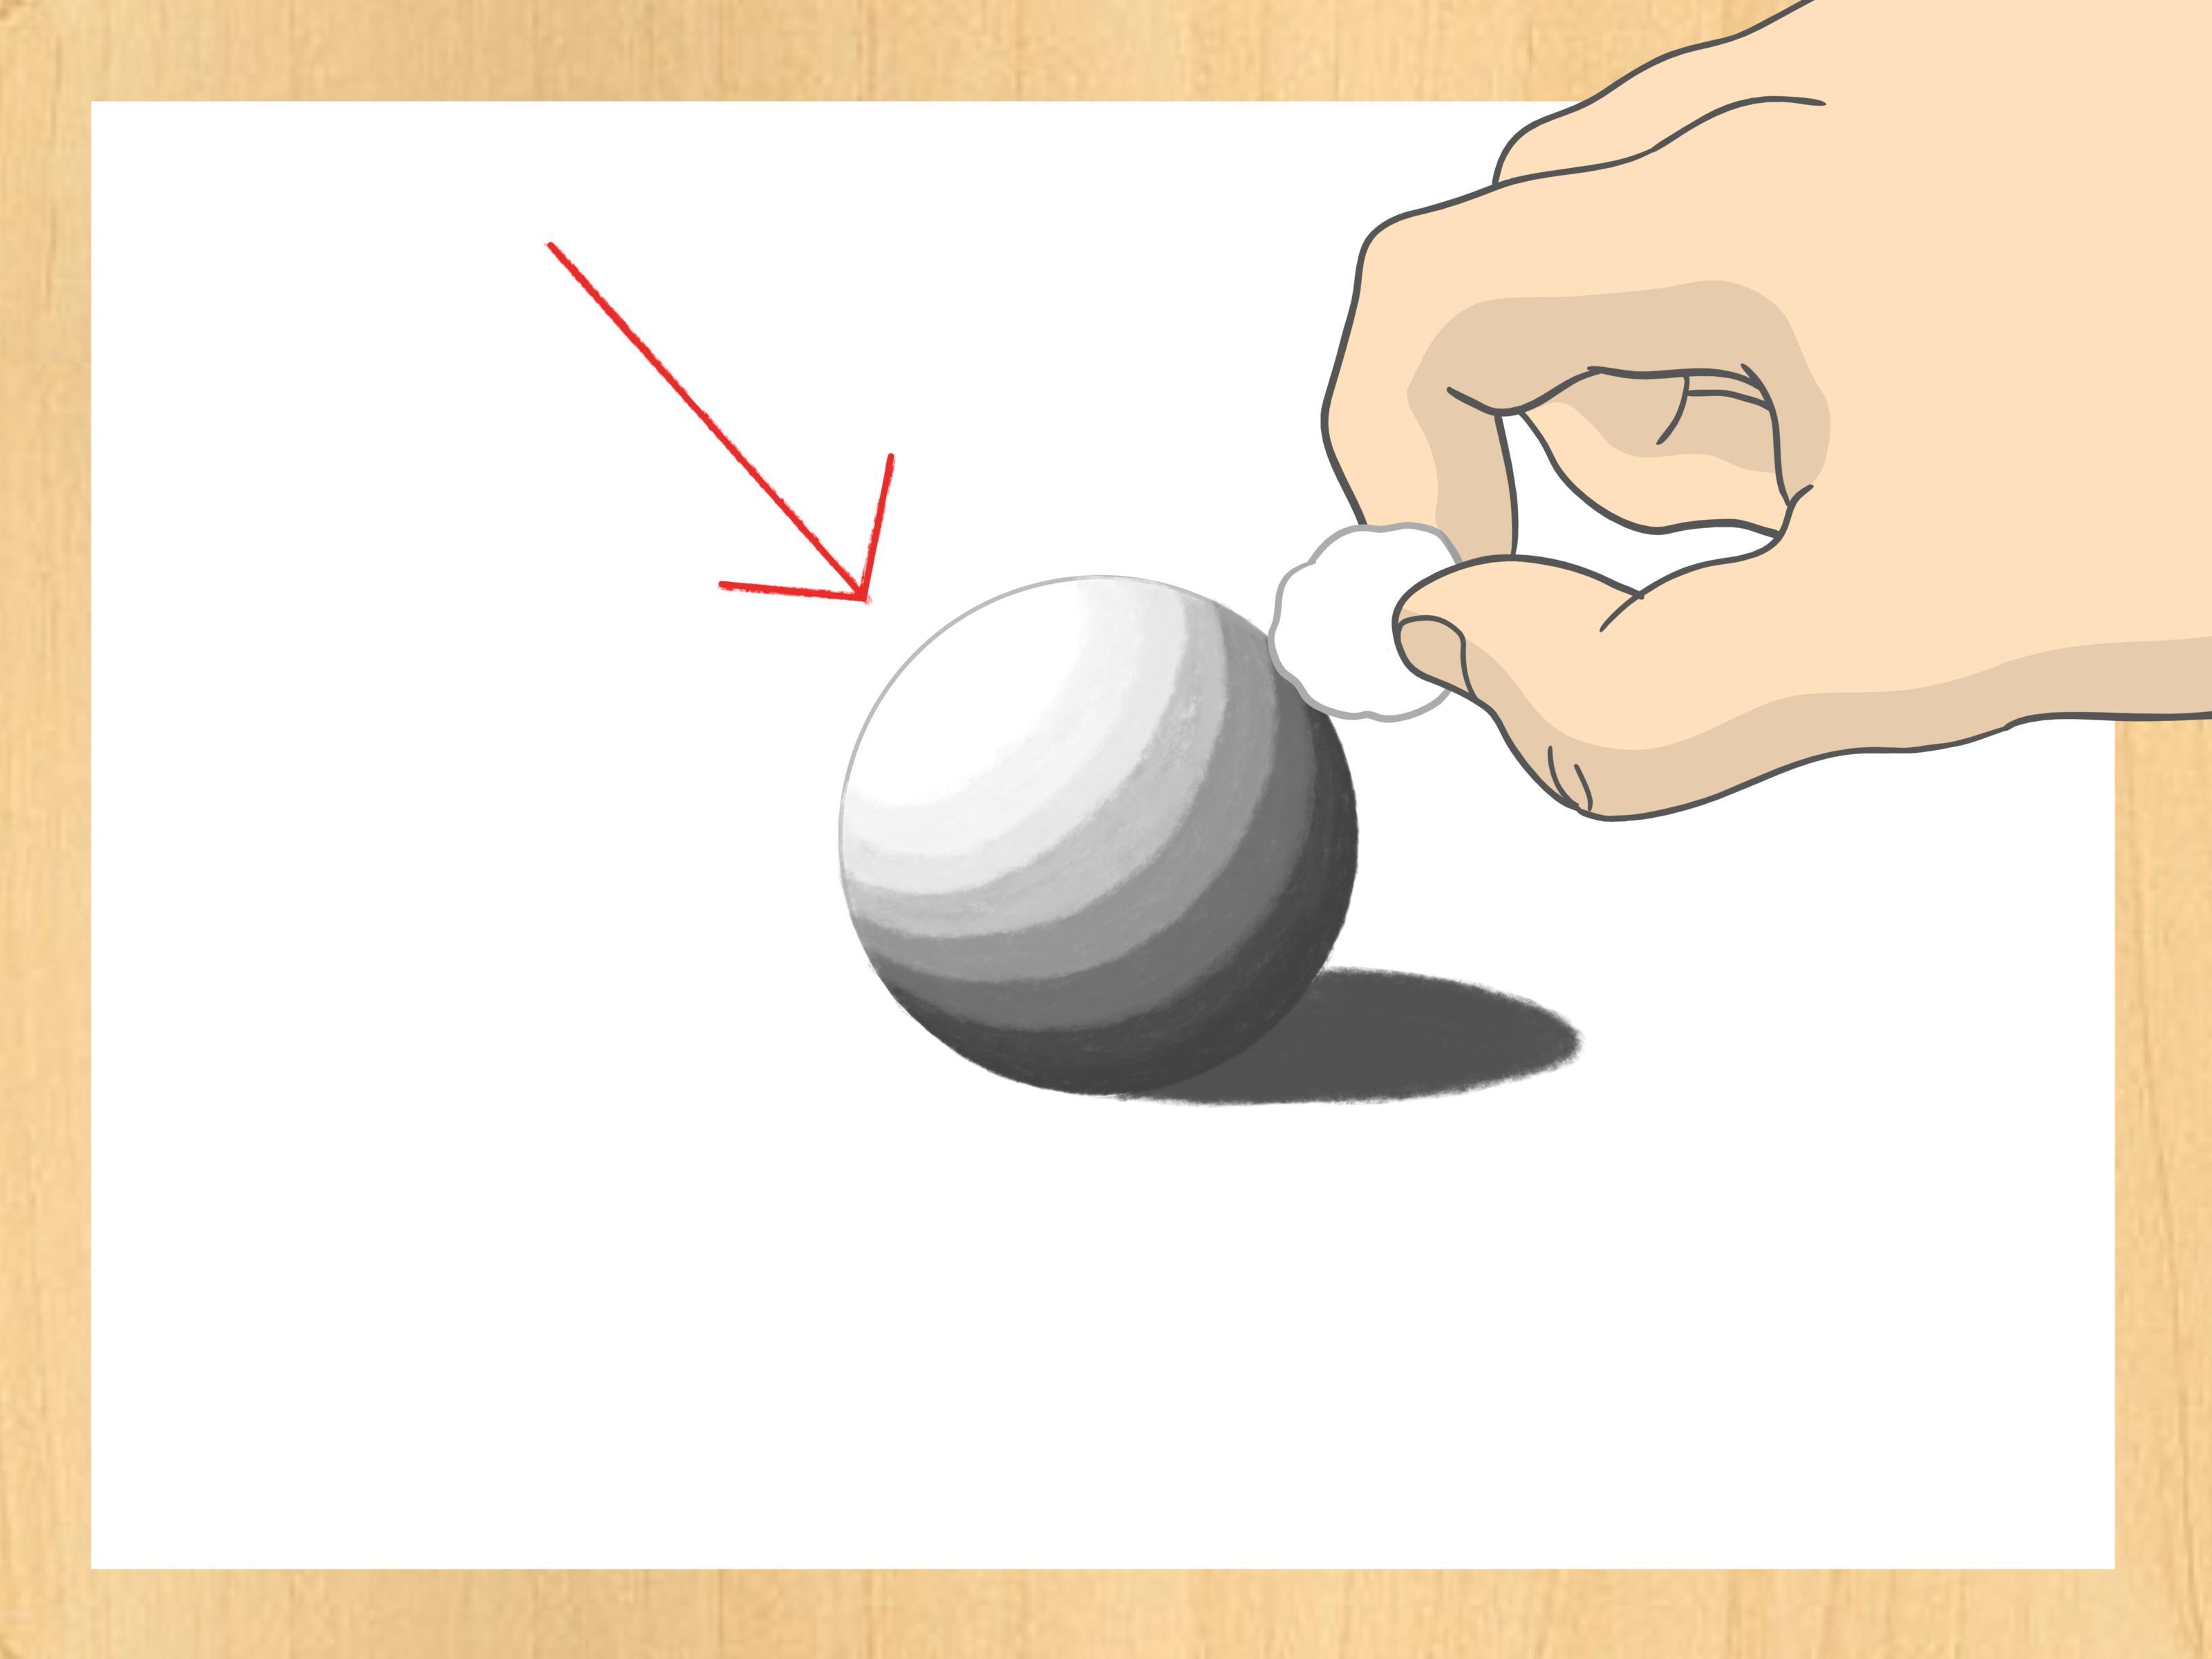 Drawn spheric easy Ways  a Sphere Draw